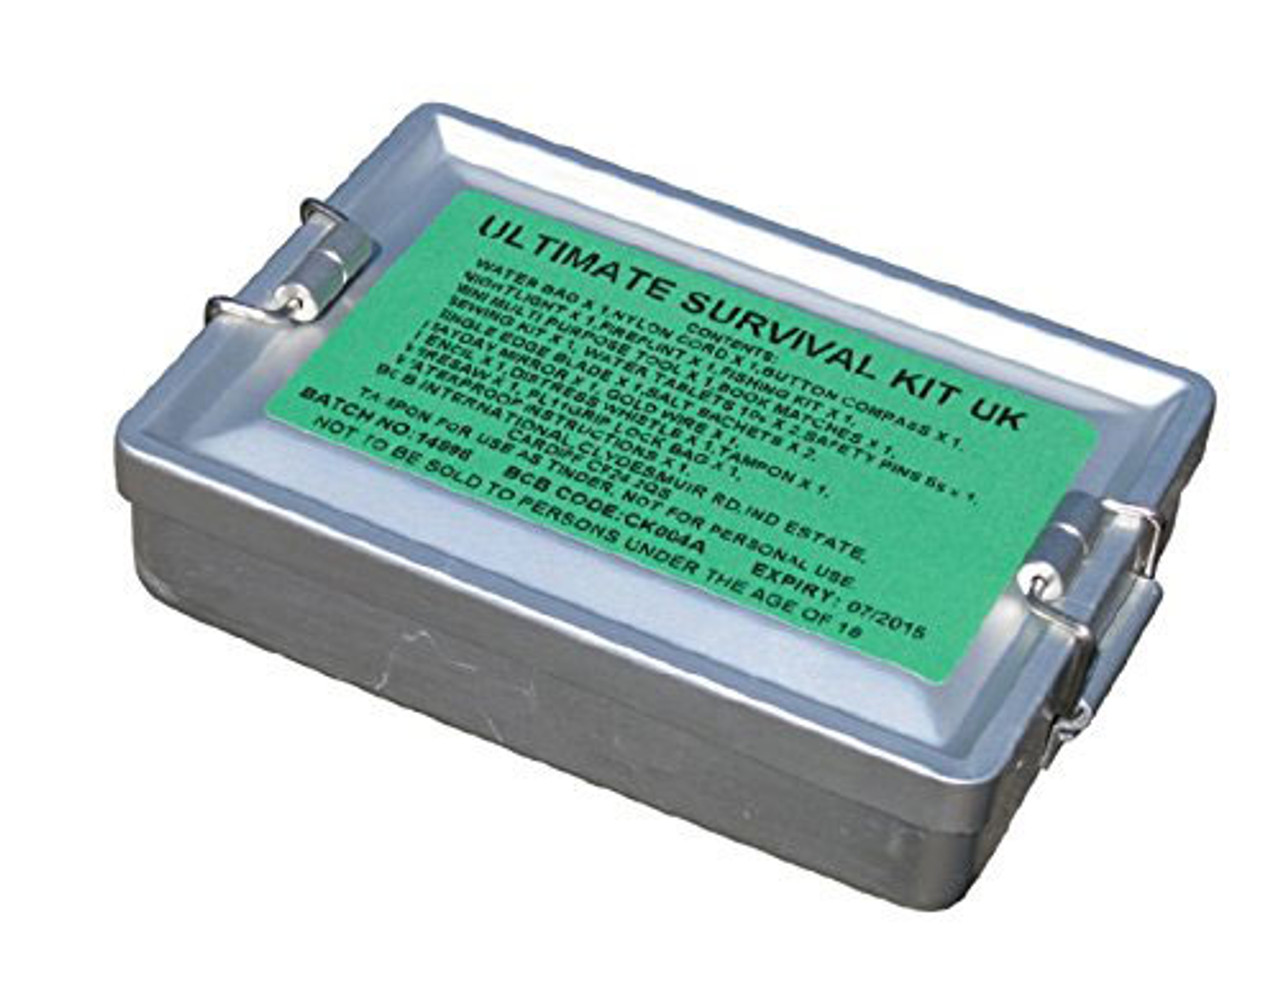 Bushcraft Ultimate Survival Kit UK